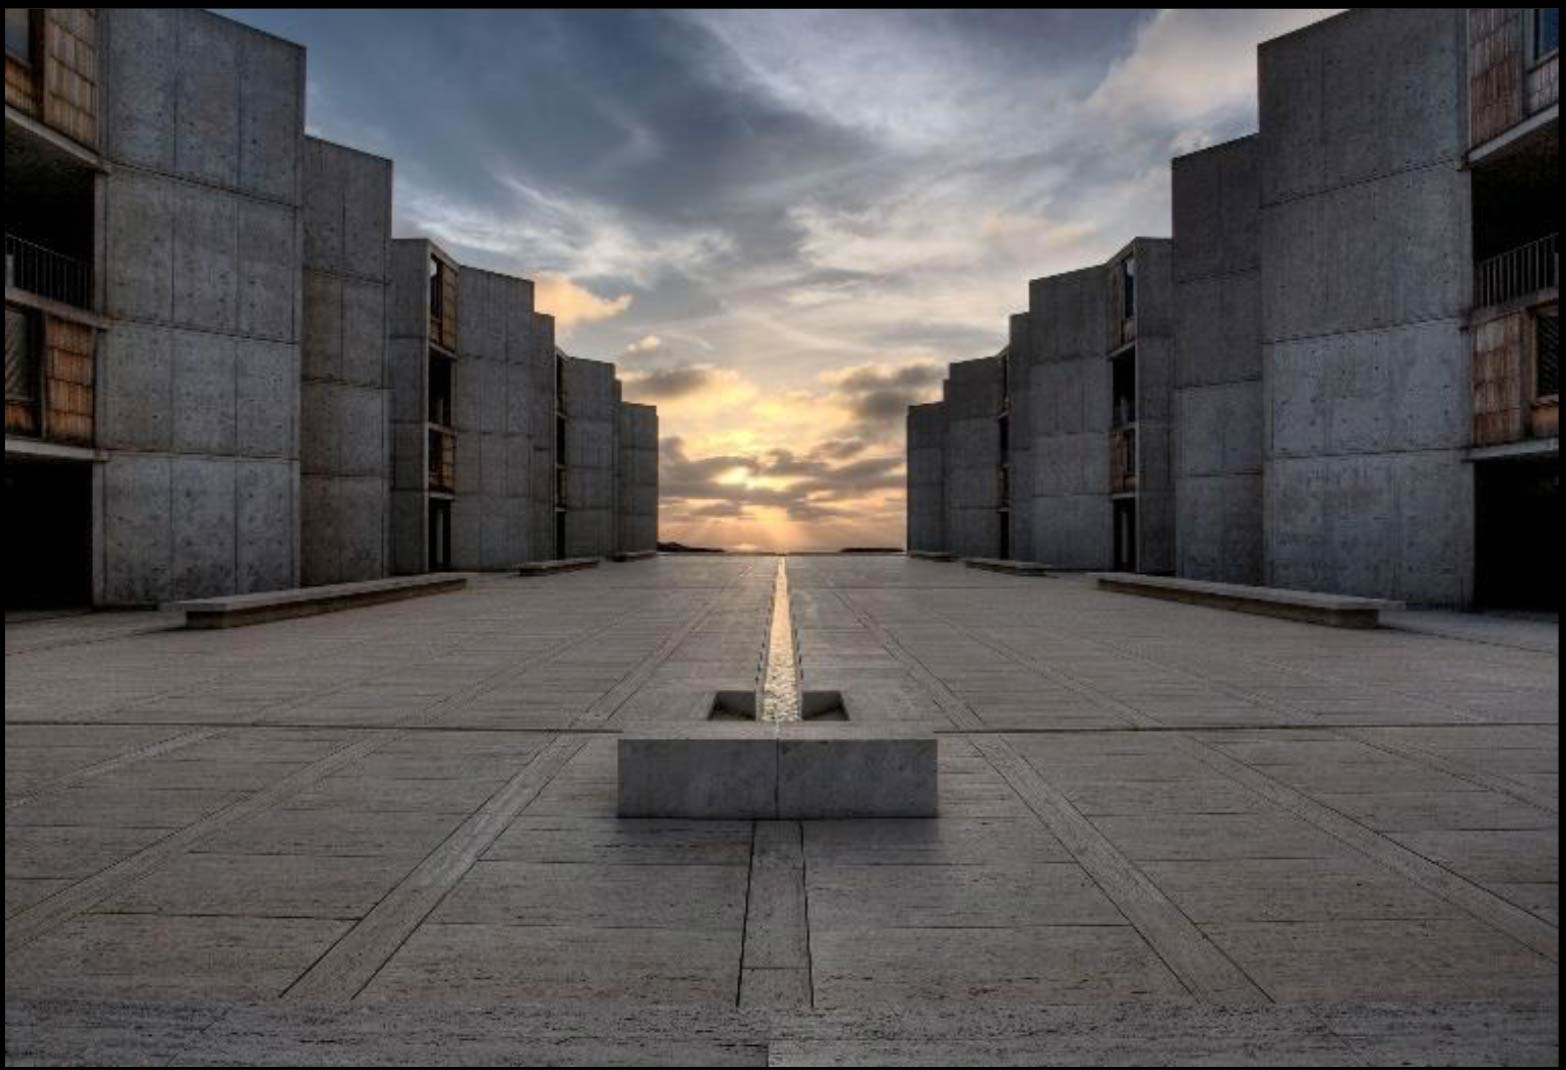 The Salk Institute, California